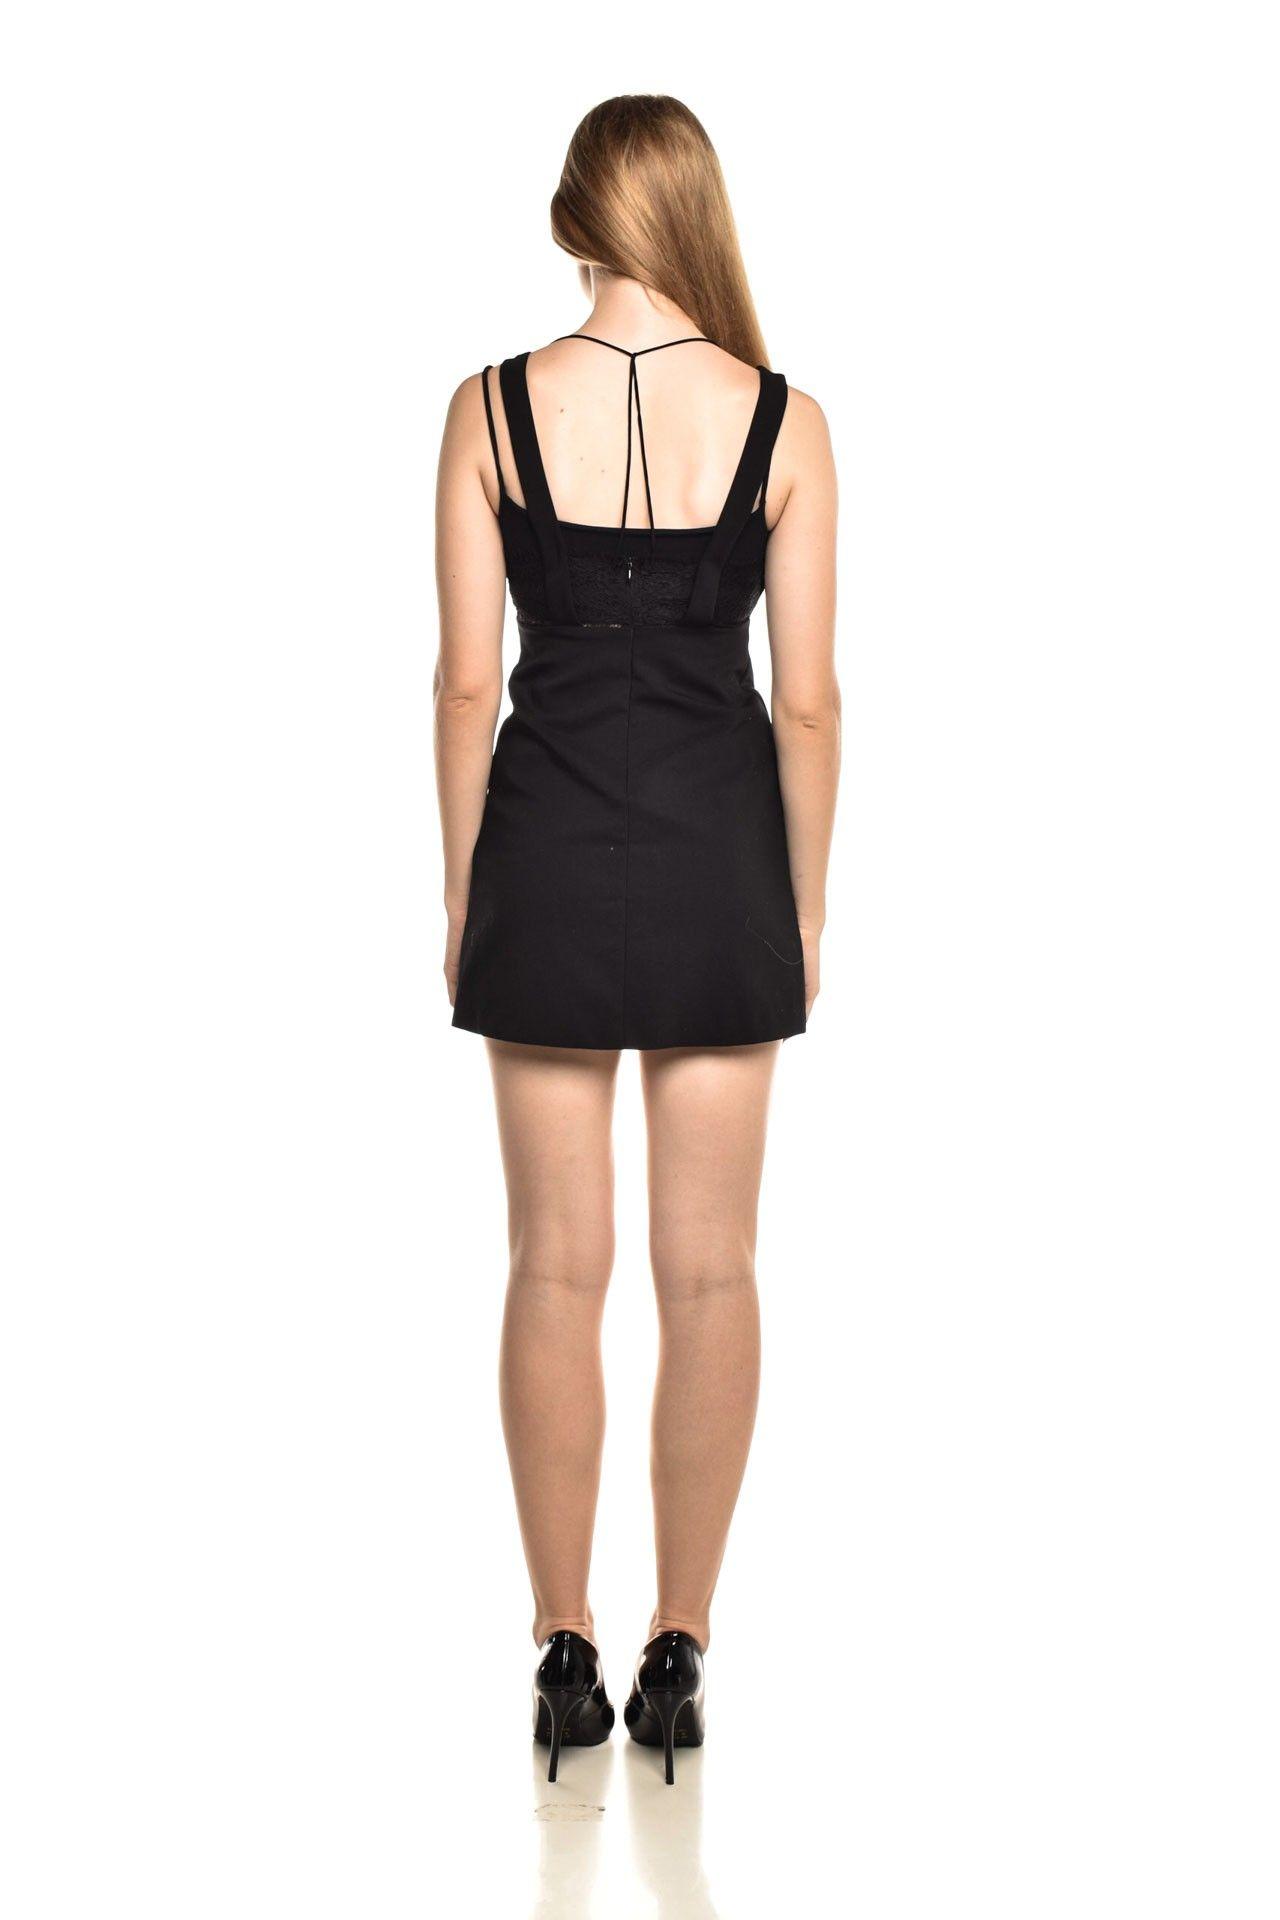 Zara - Vestido Detalhe Renda - Foto 4